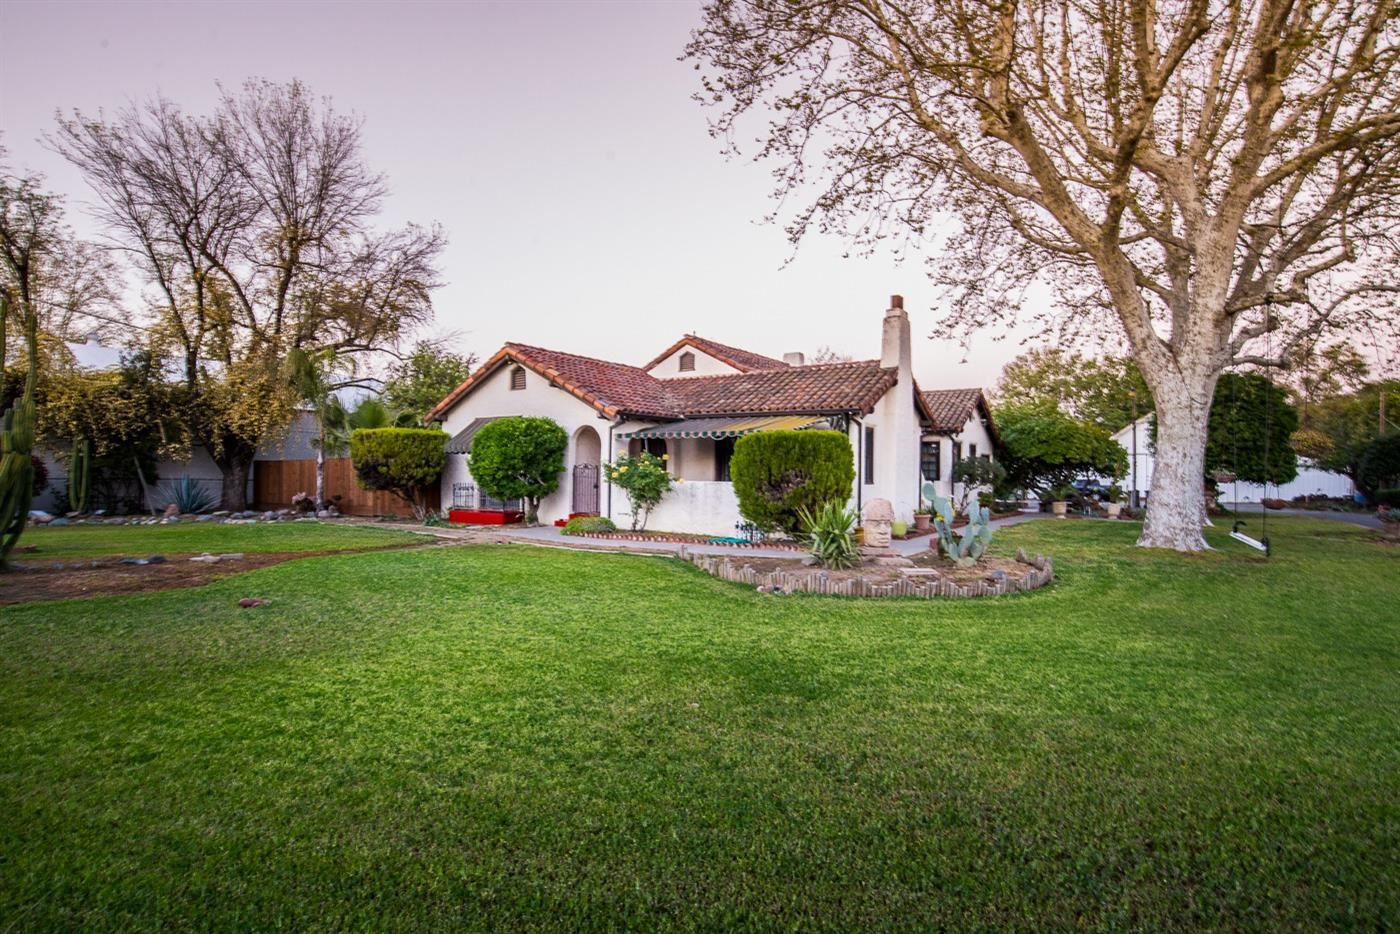 Photo of 125 East Street, Woodland, CA 95776 (MLS # 221049588)